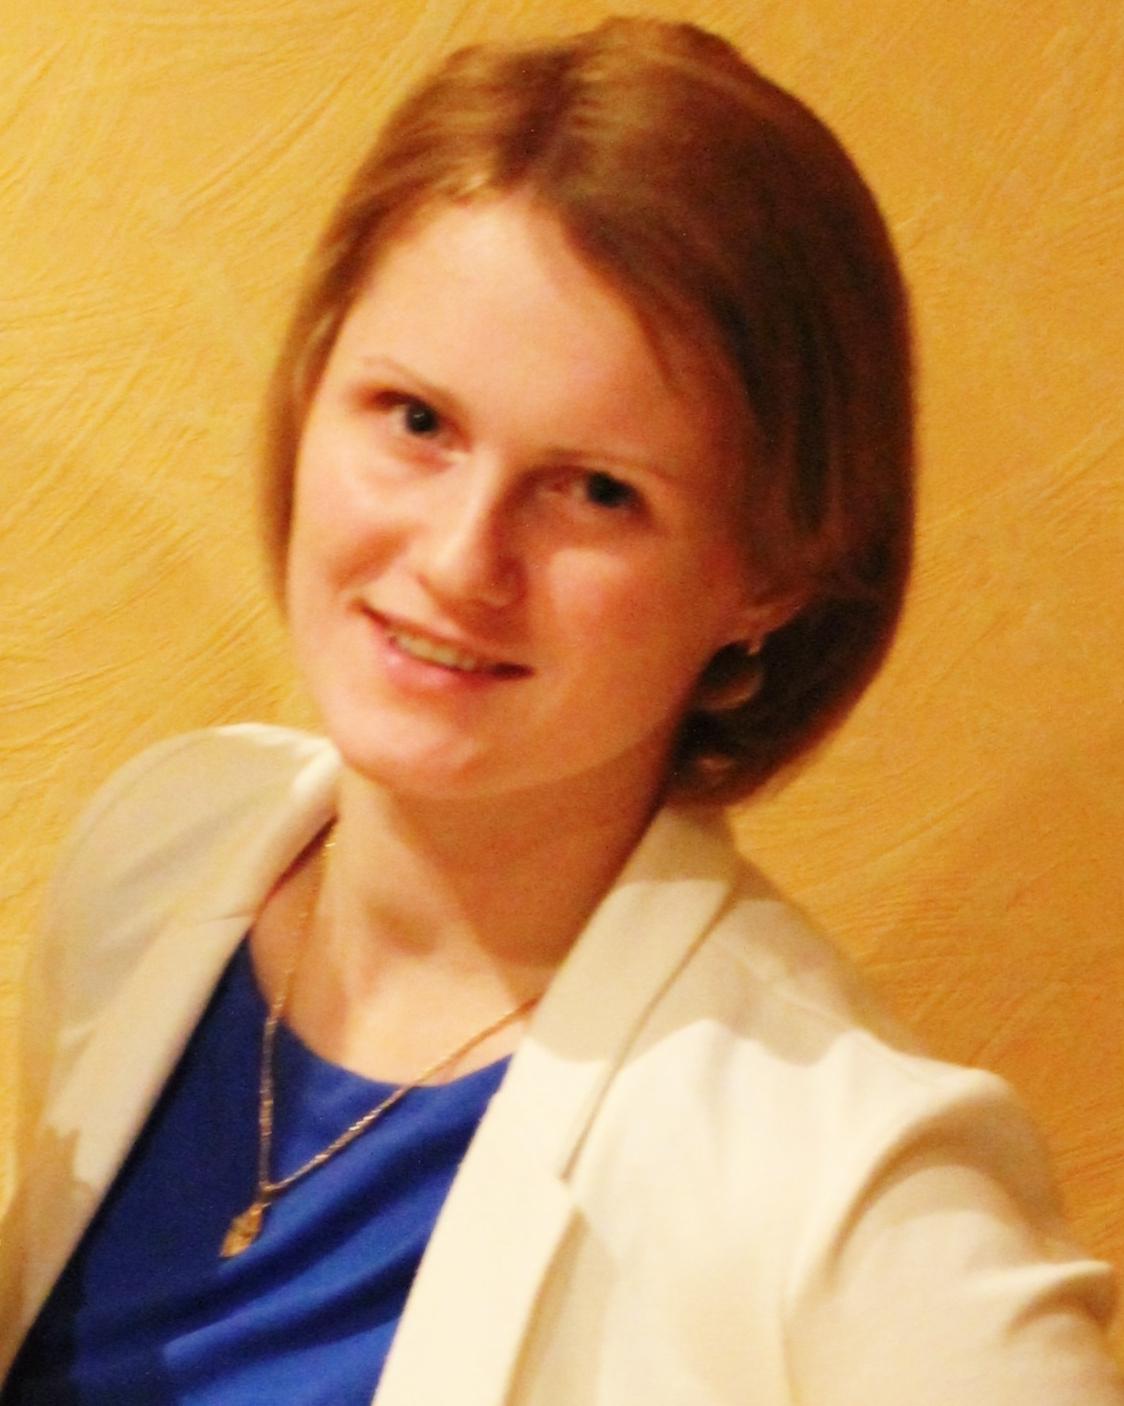 Agnese Sidorova